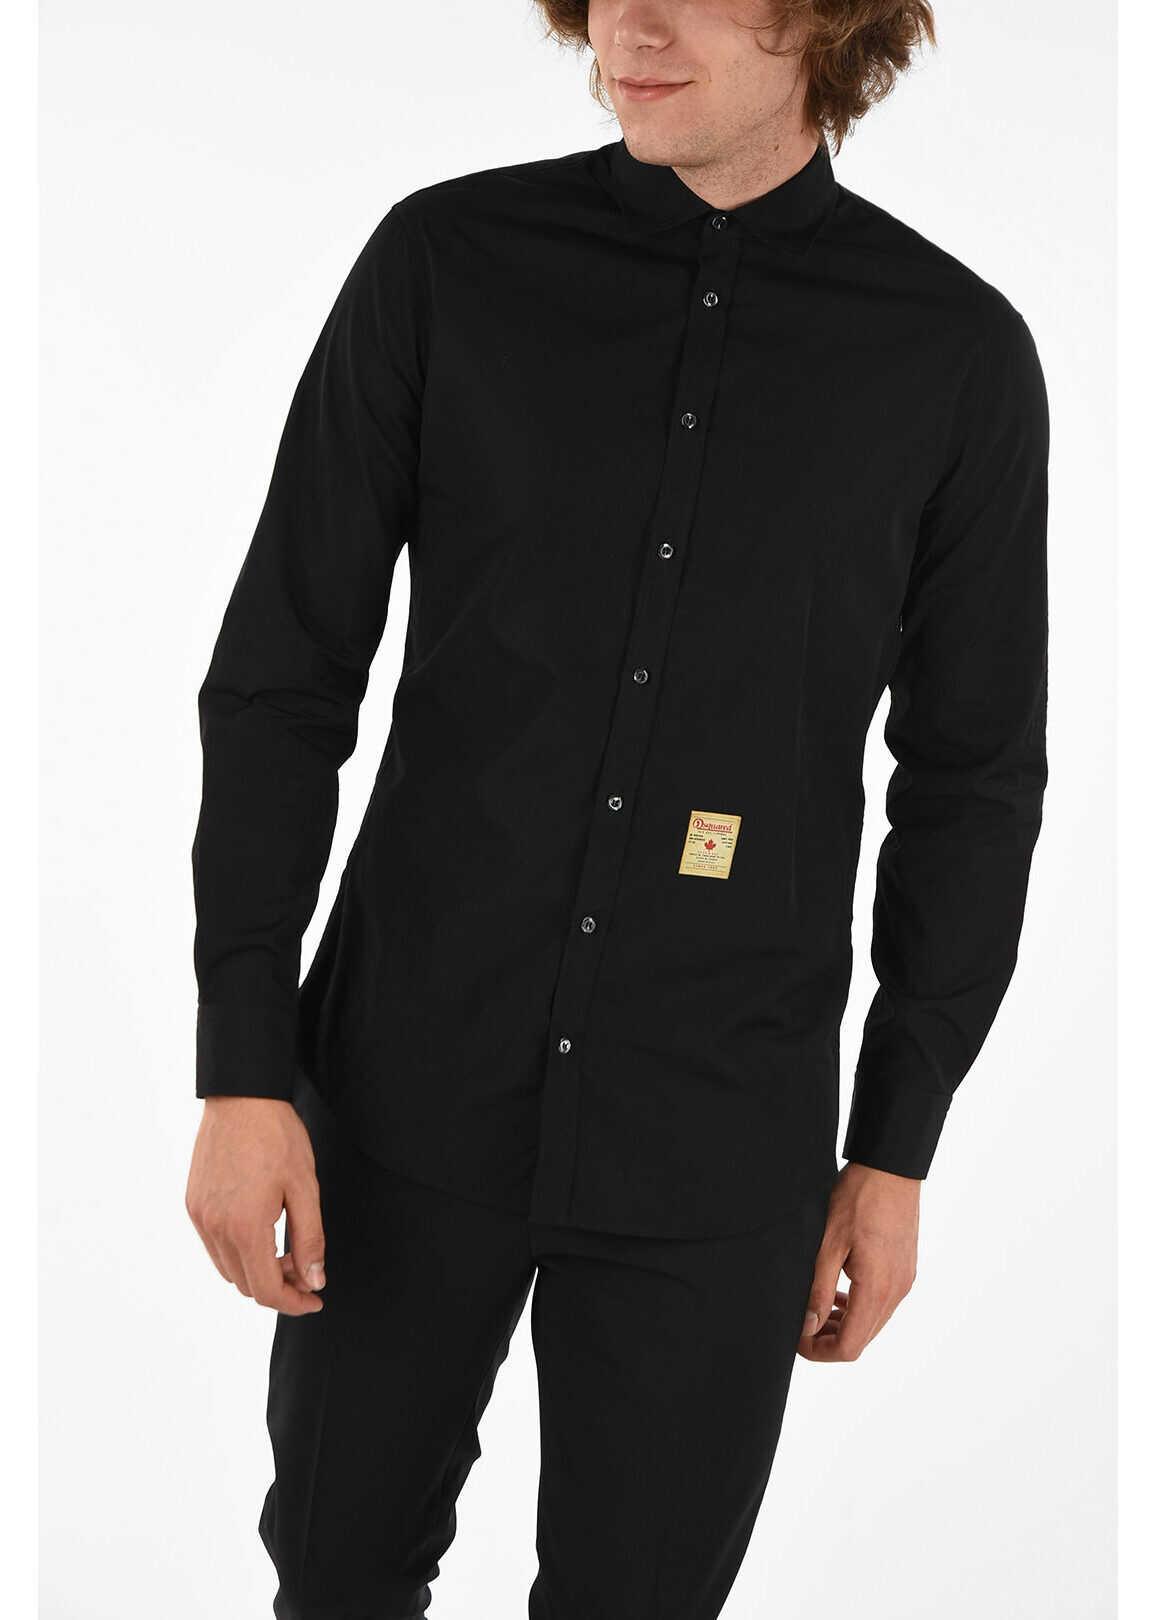 DSQUARED2 M.B FIT Shirt BLACK imagine